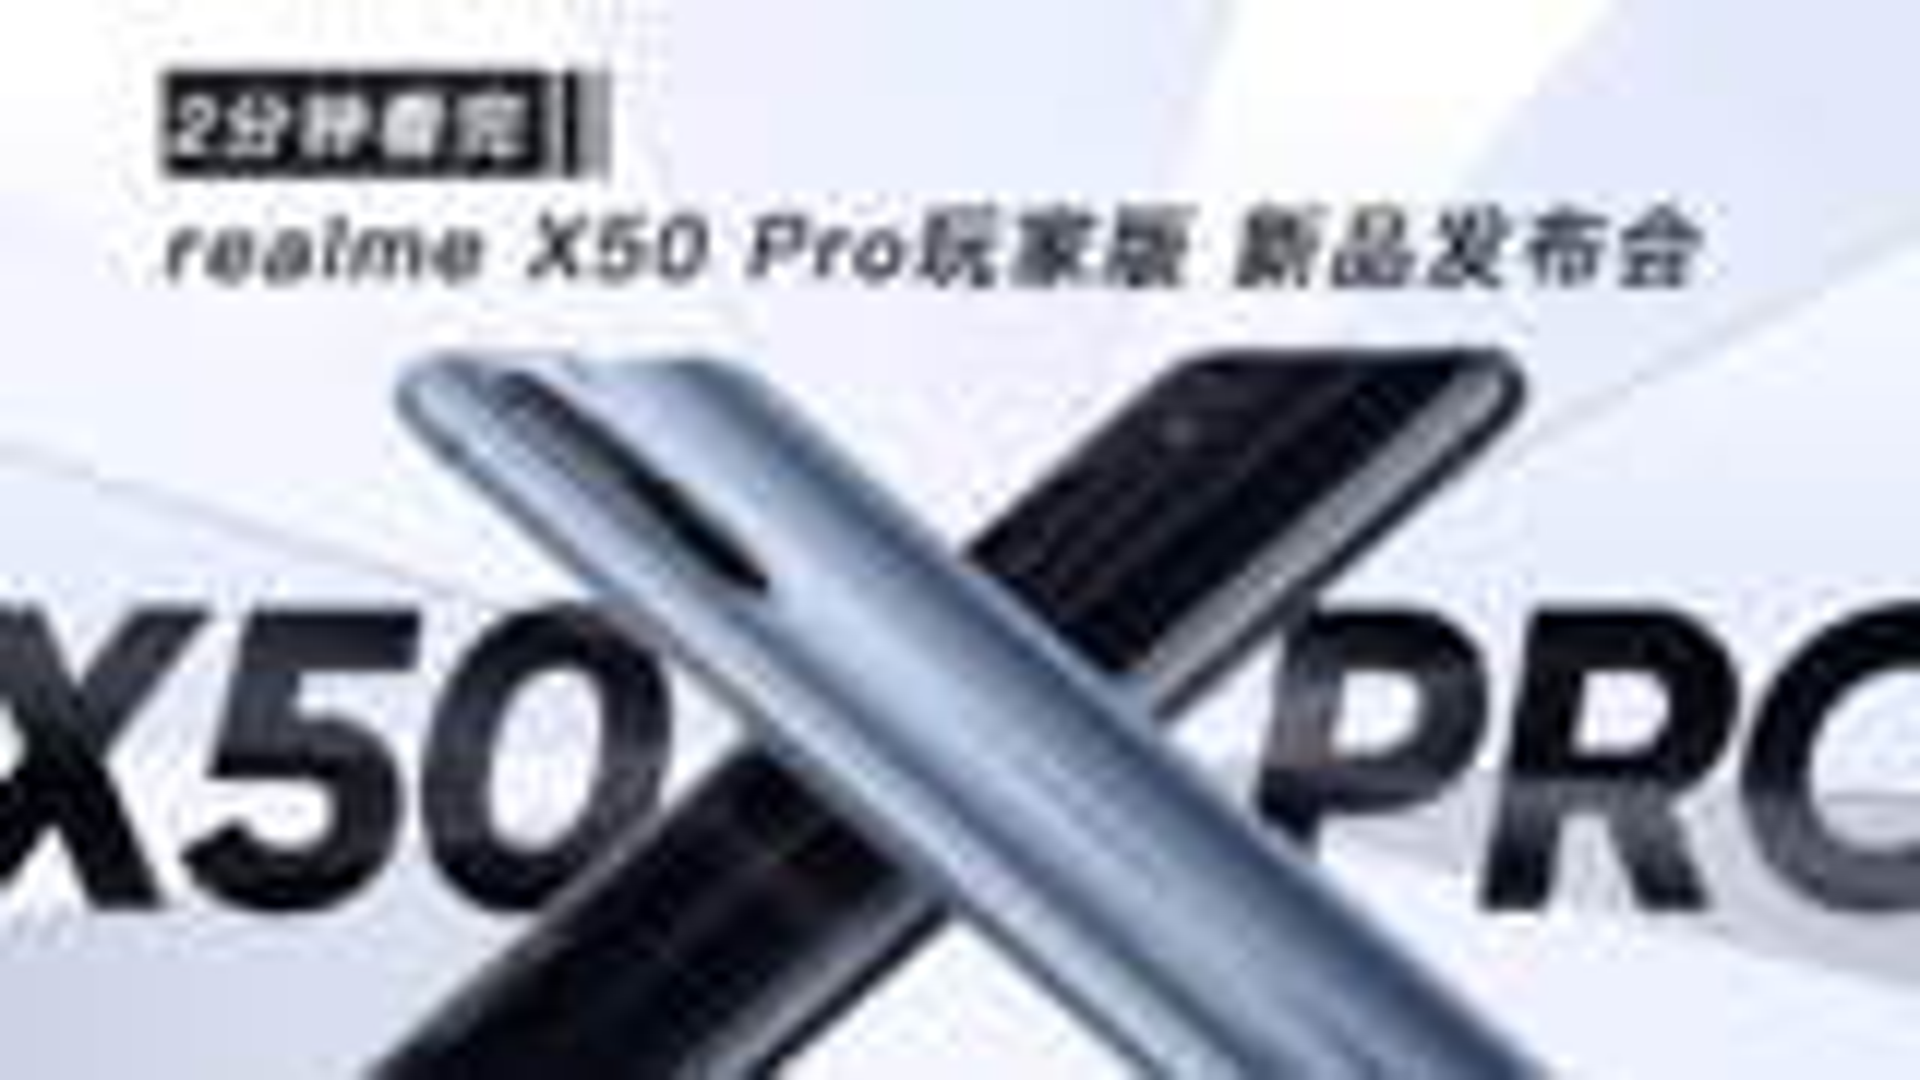 「VDGER聚焦」2分钟看完realme X50 Pro玩家版新品发布会,价格一降再降!